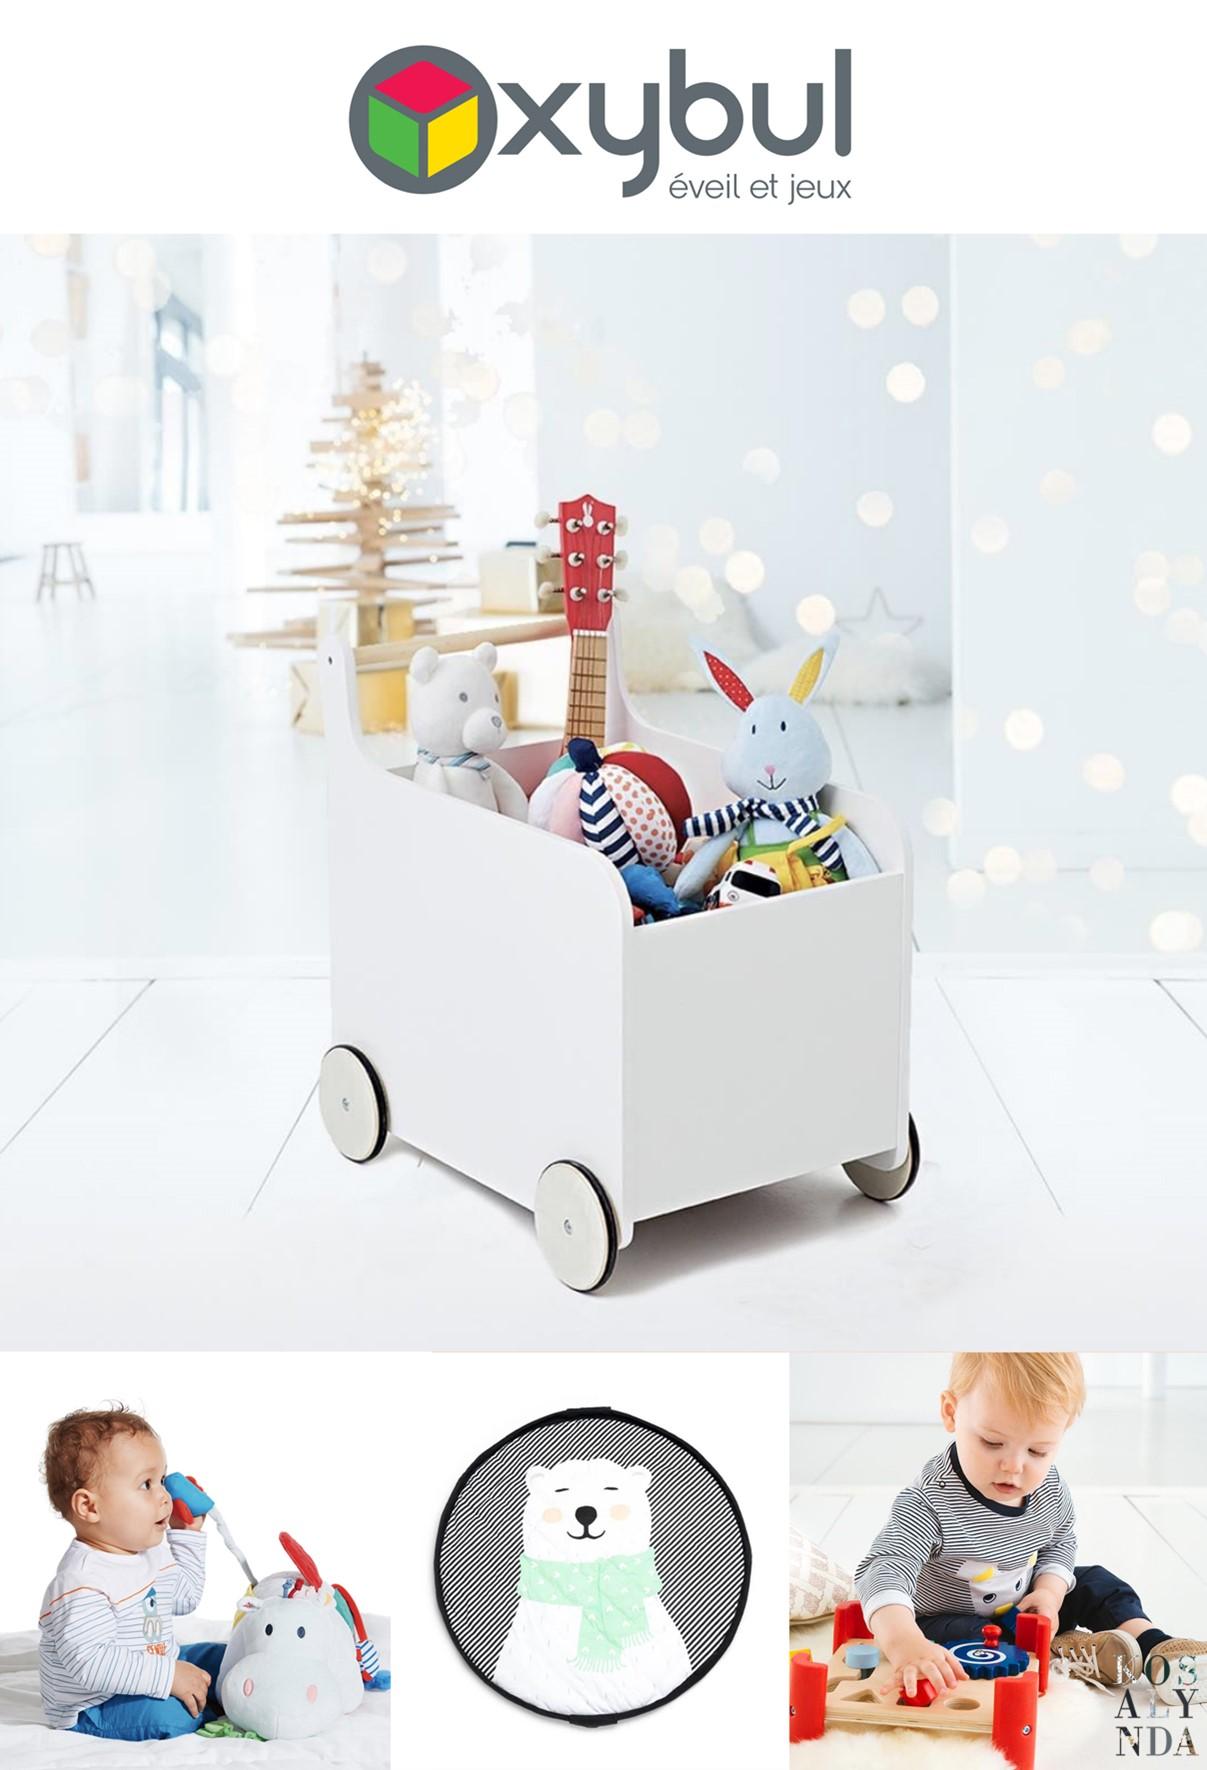 site tendance pour cadeau bebe oxybul